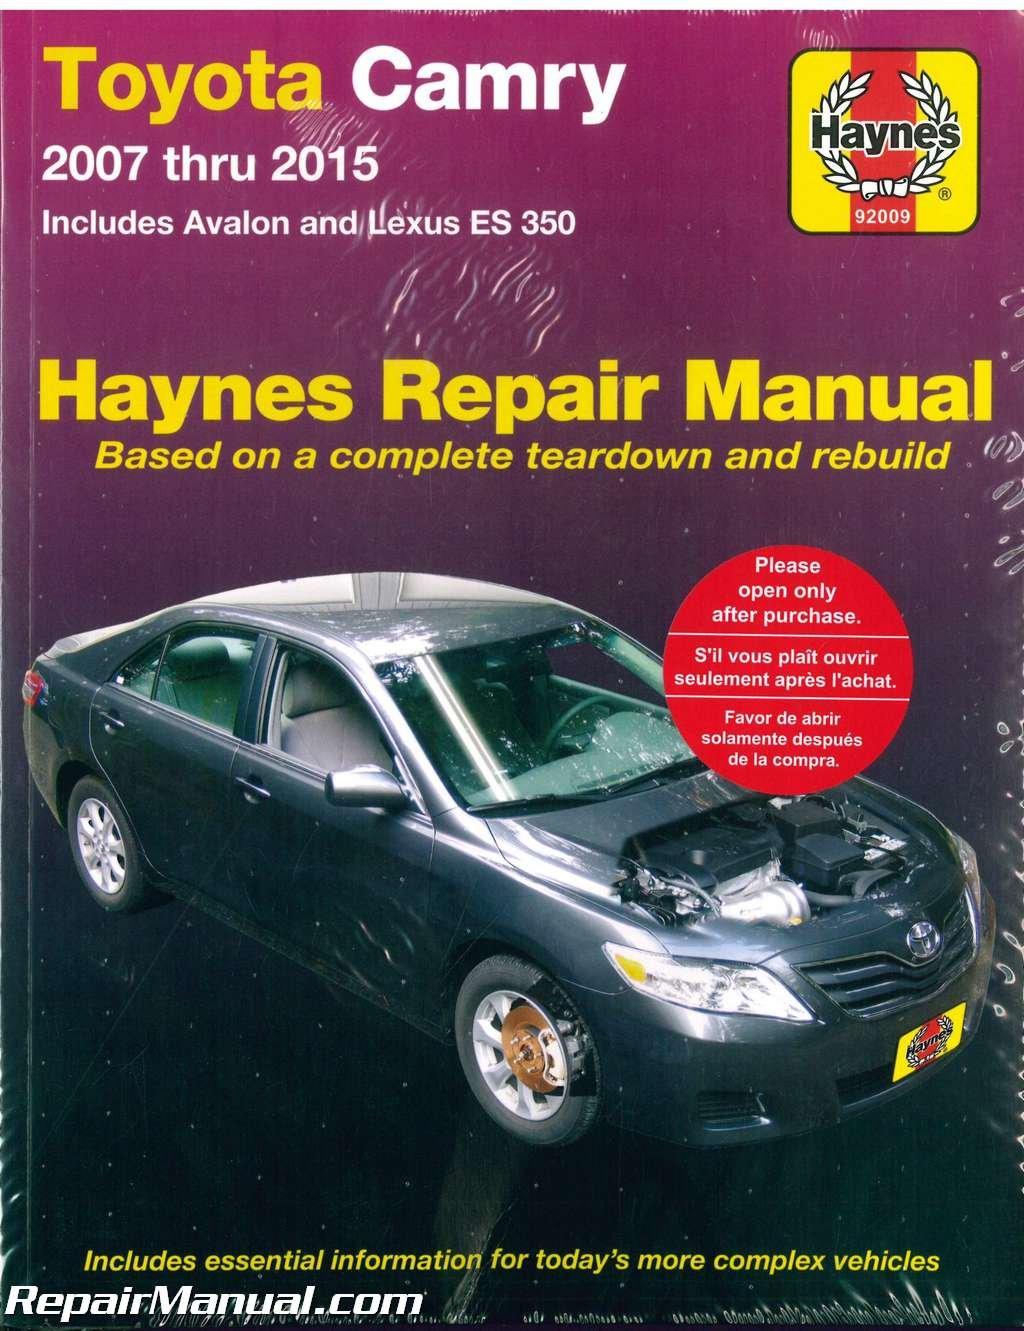 2015 Lexus Is 250 Repair Manual Ebook 1994 Oldsmobile Achieva 2400 Battery Fuse Box Diagram Array H92009 Haynes Toyota Camry Avalon Es 350 2007 Car Rh Amazon